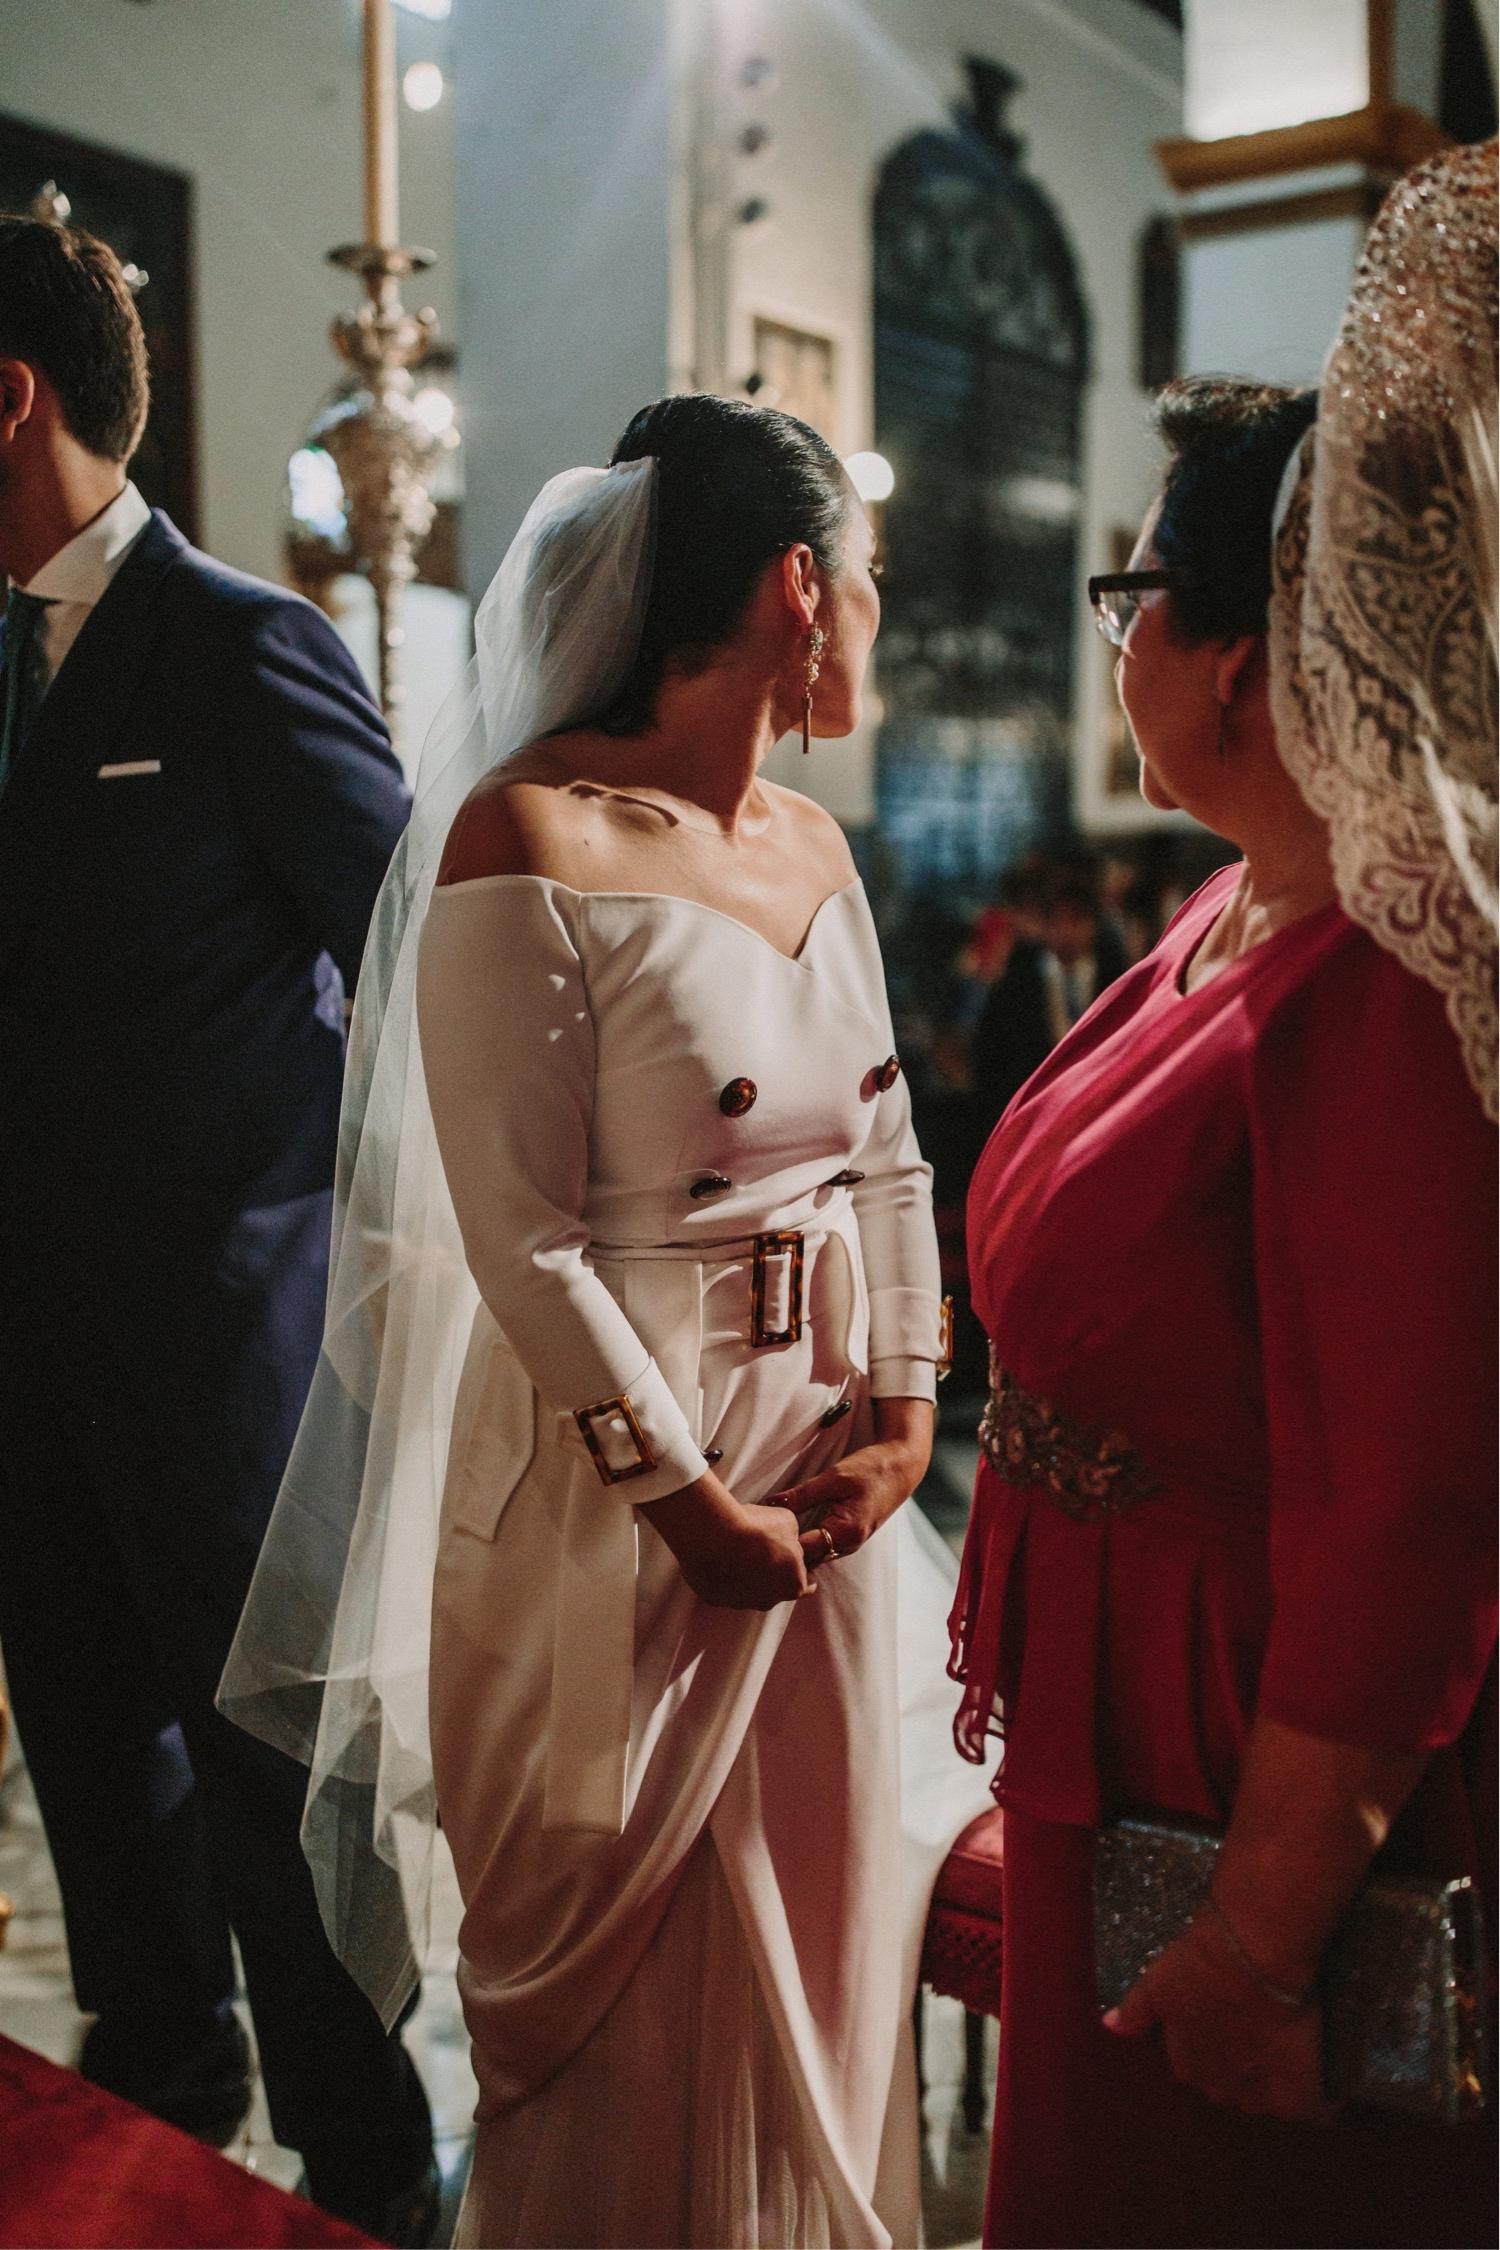 26_wedding-ernestovillalba-anabel-diego-2076-ASE.jpg